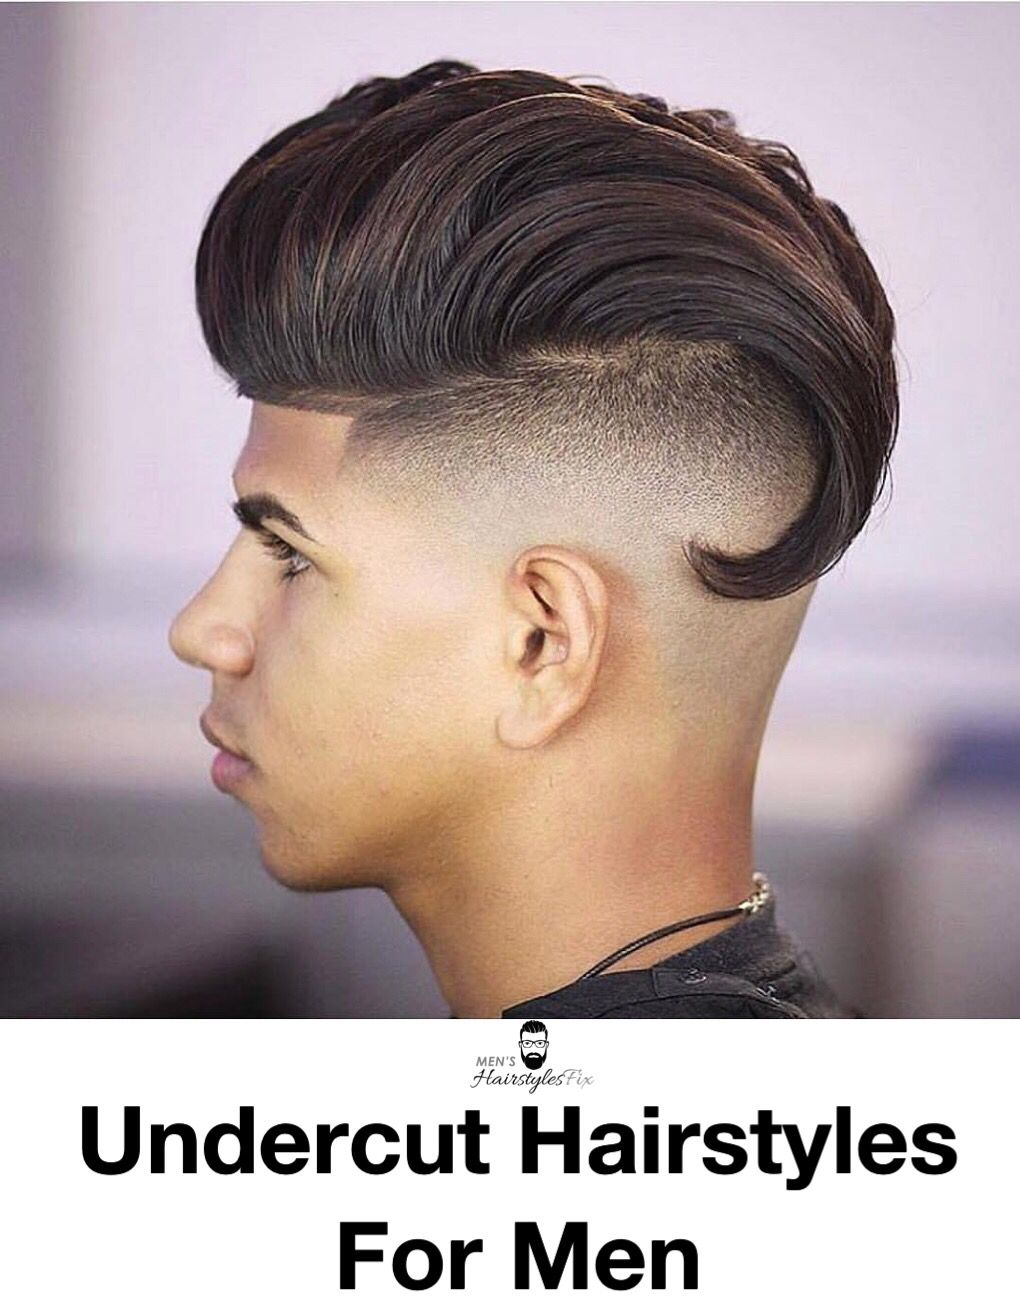 Mens comb over haircut  cool undercut hairstyles for men  mens undercut  pinterest